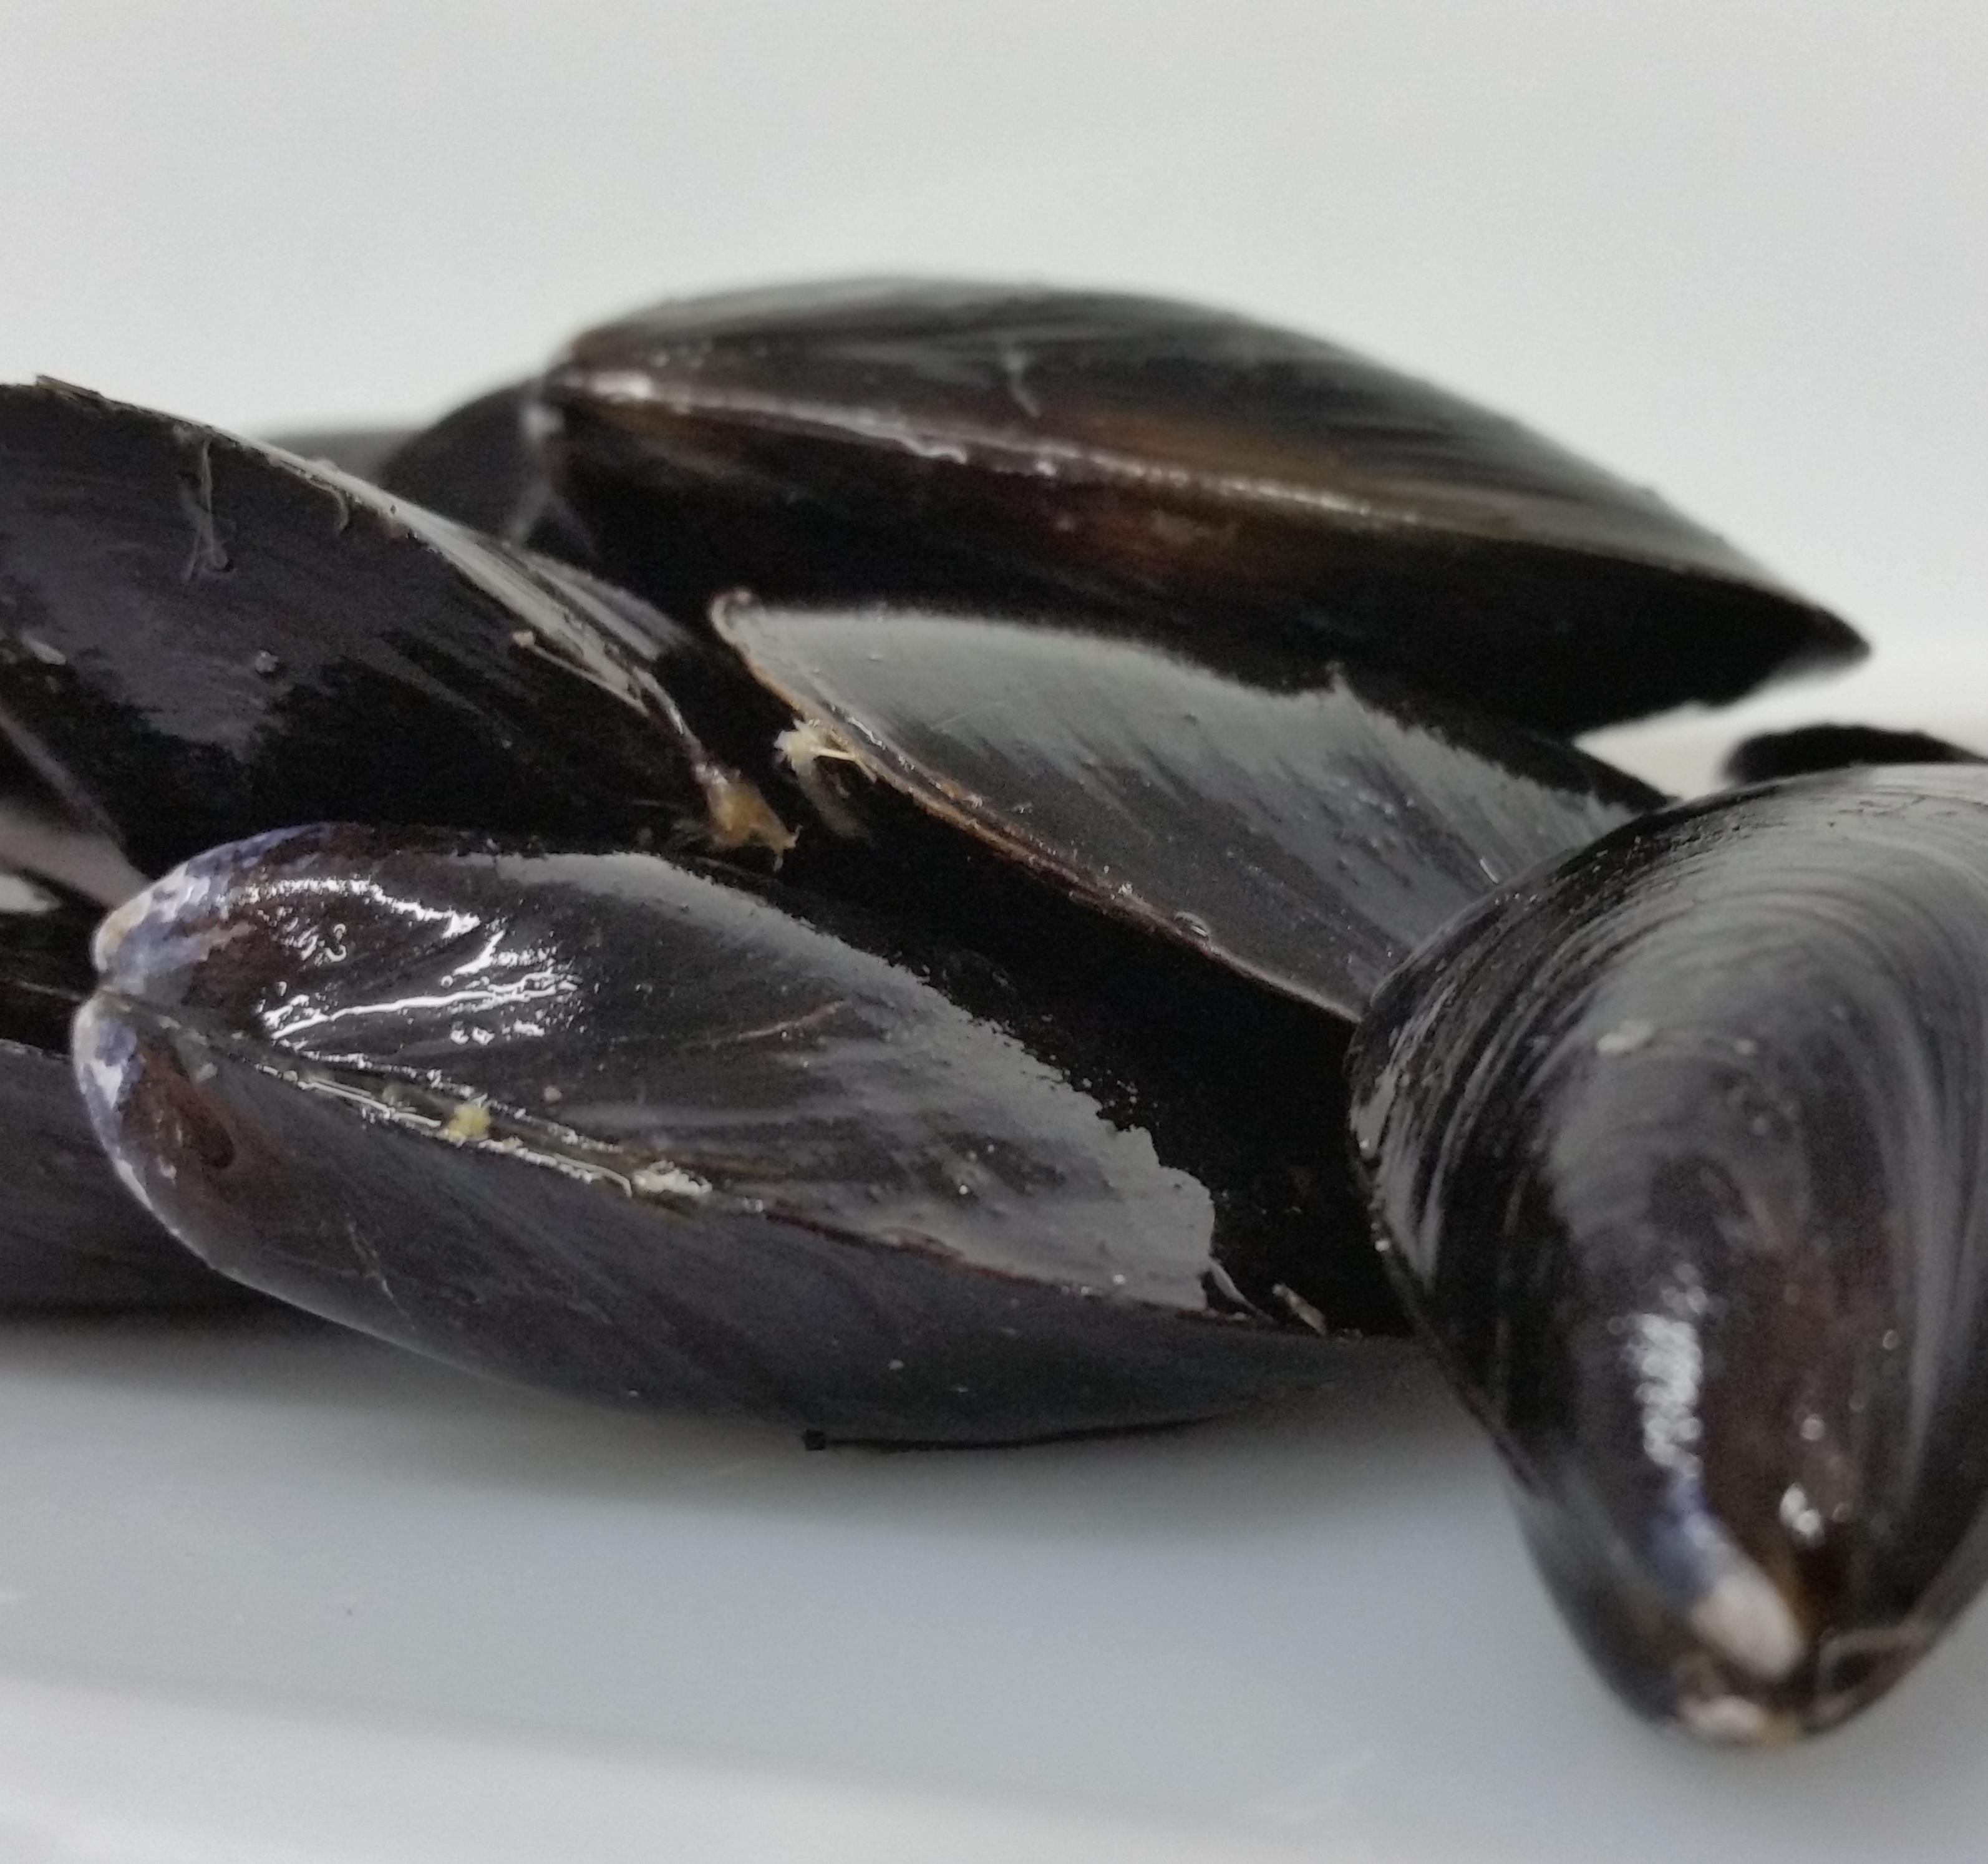 Jordan Brothers P.E.I Mussels